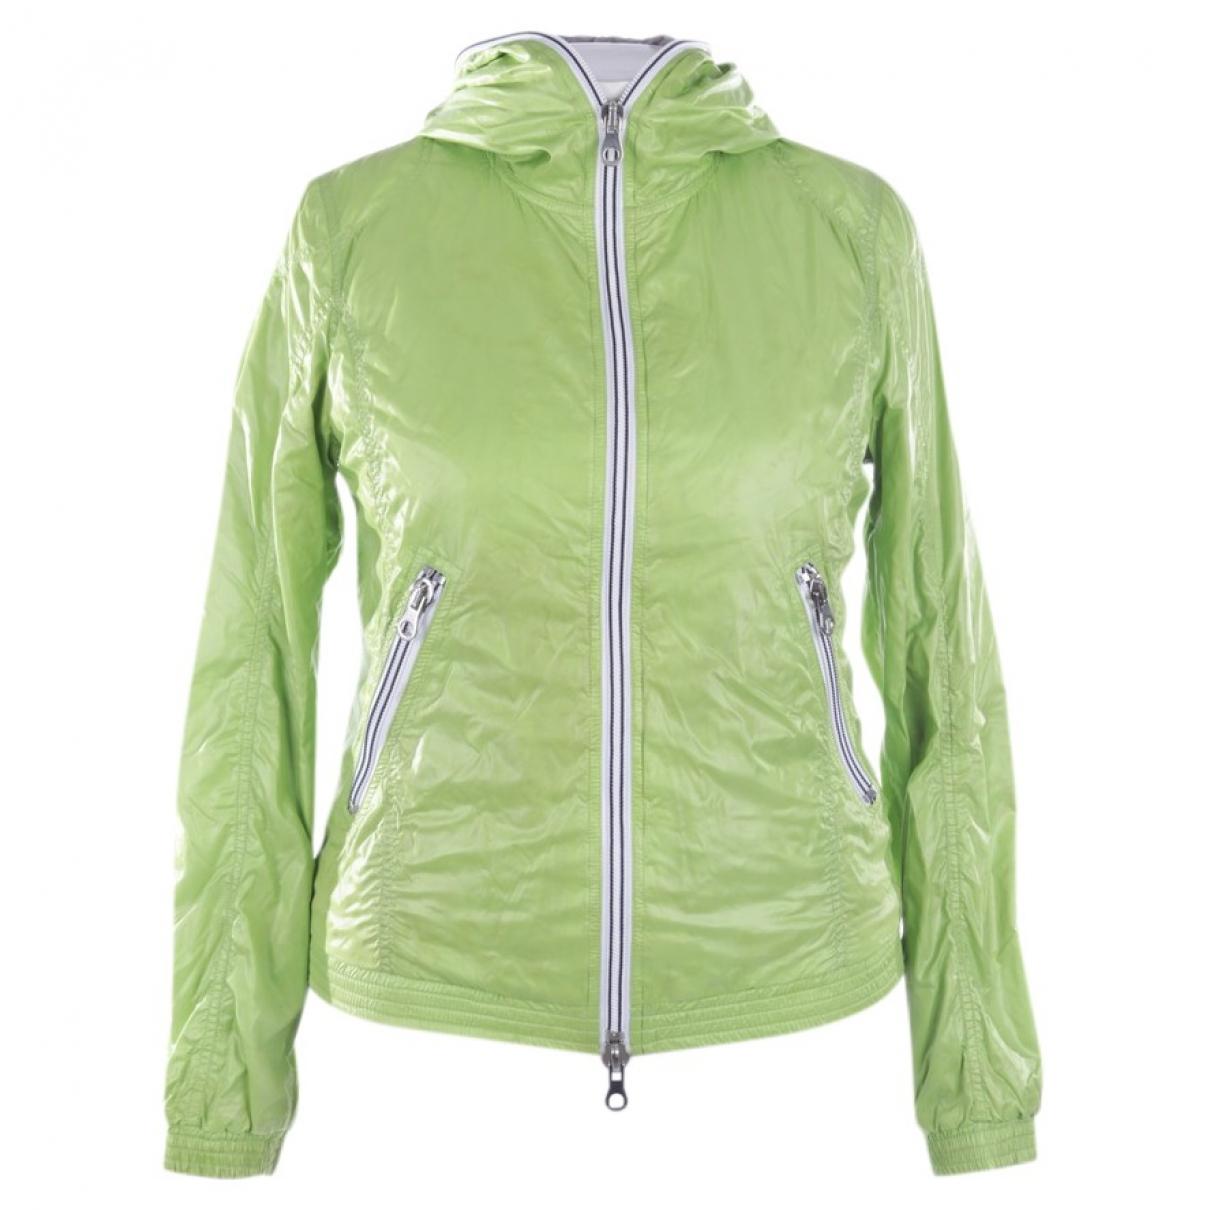 Duvetica \N Green jacket for Women 40 FR